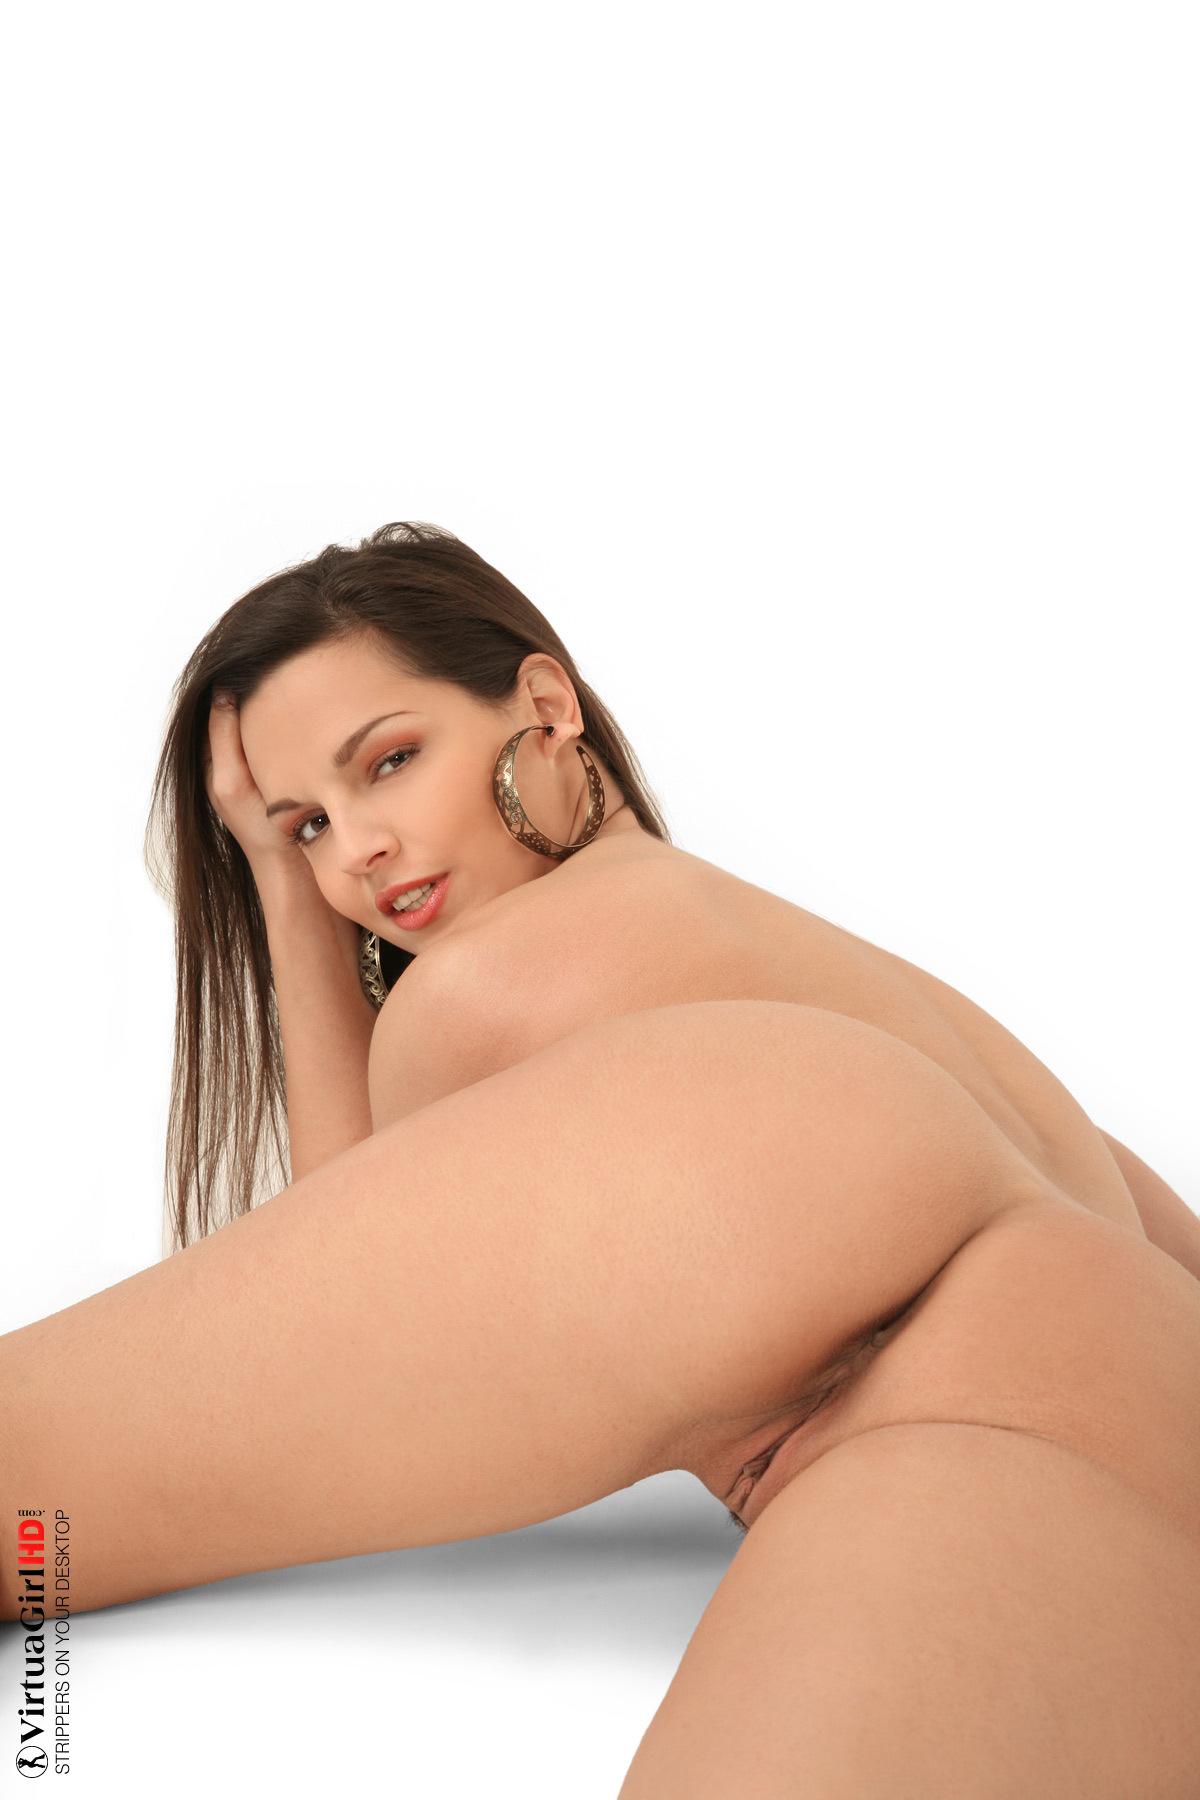 stripping girls in public